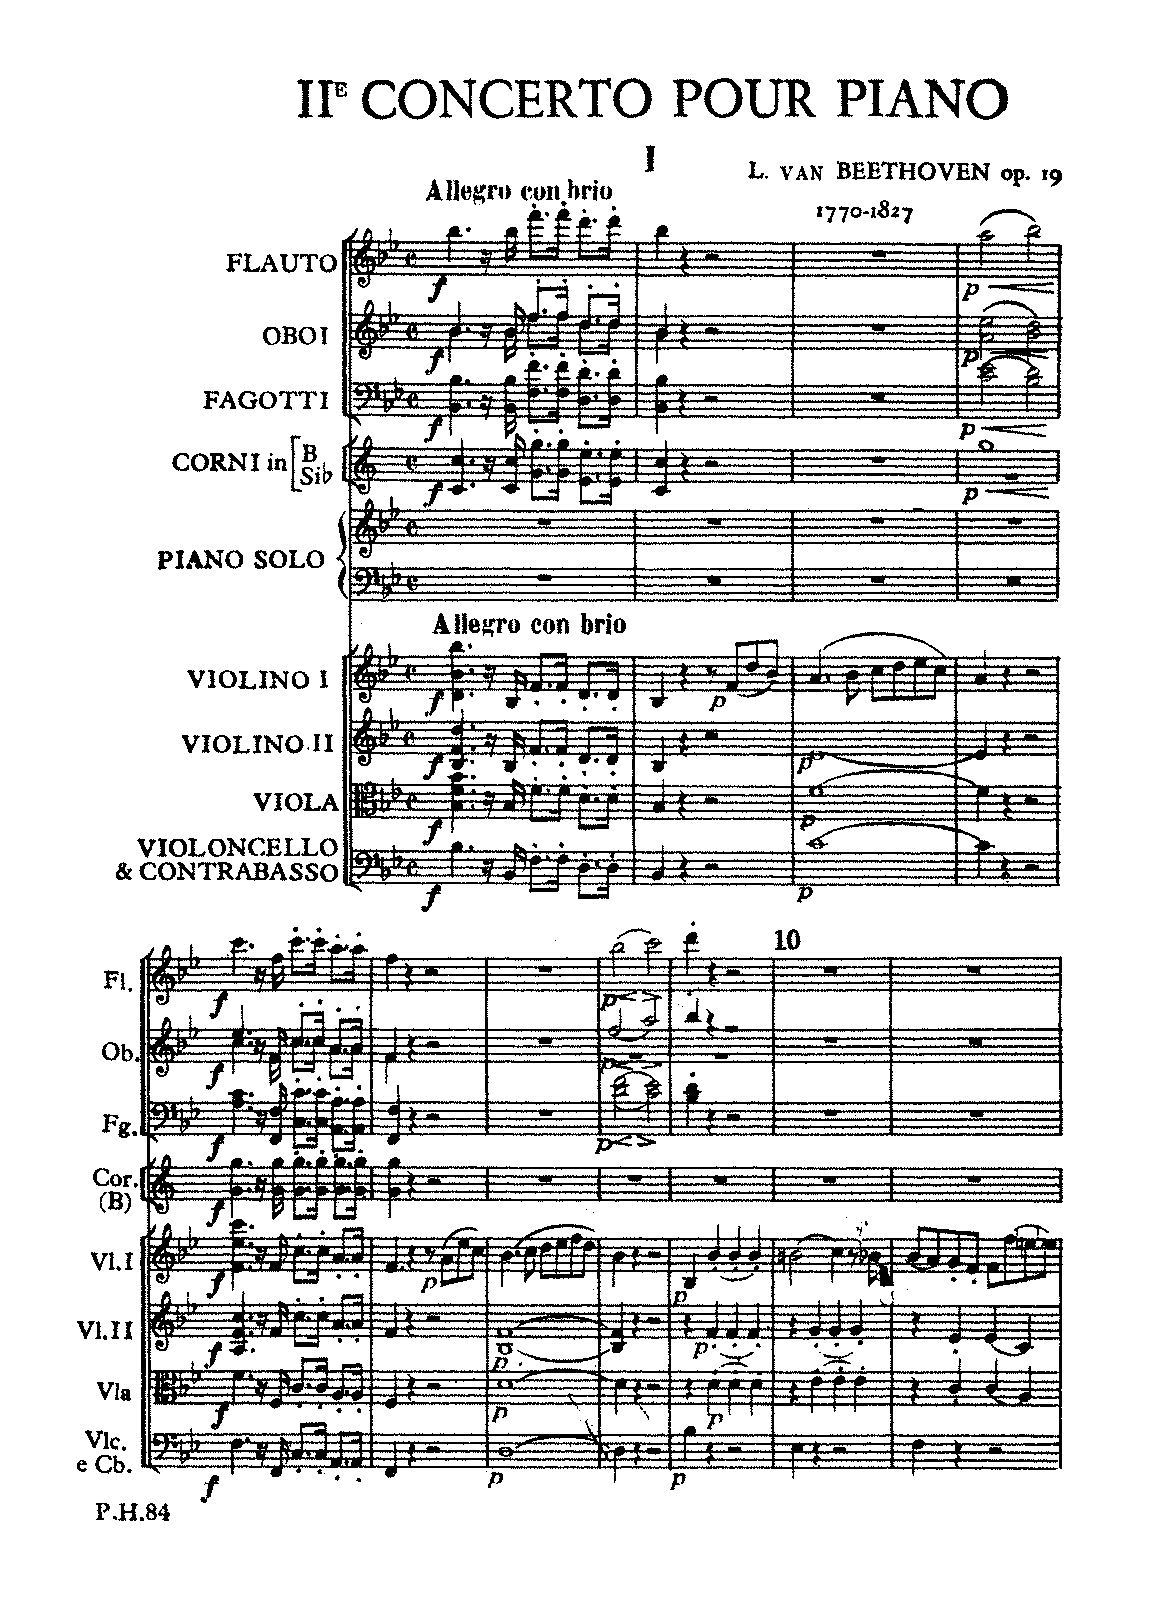 Piano Concerto No.2, Op.19 (Beethoven, Ludwig van) - IMSLP ...